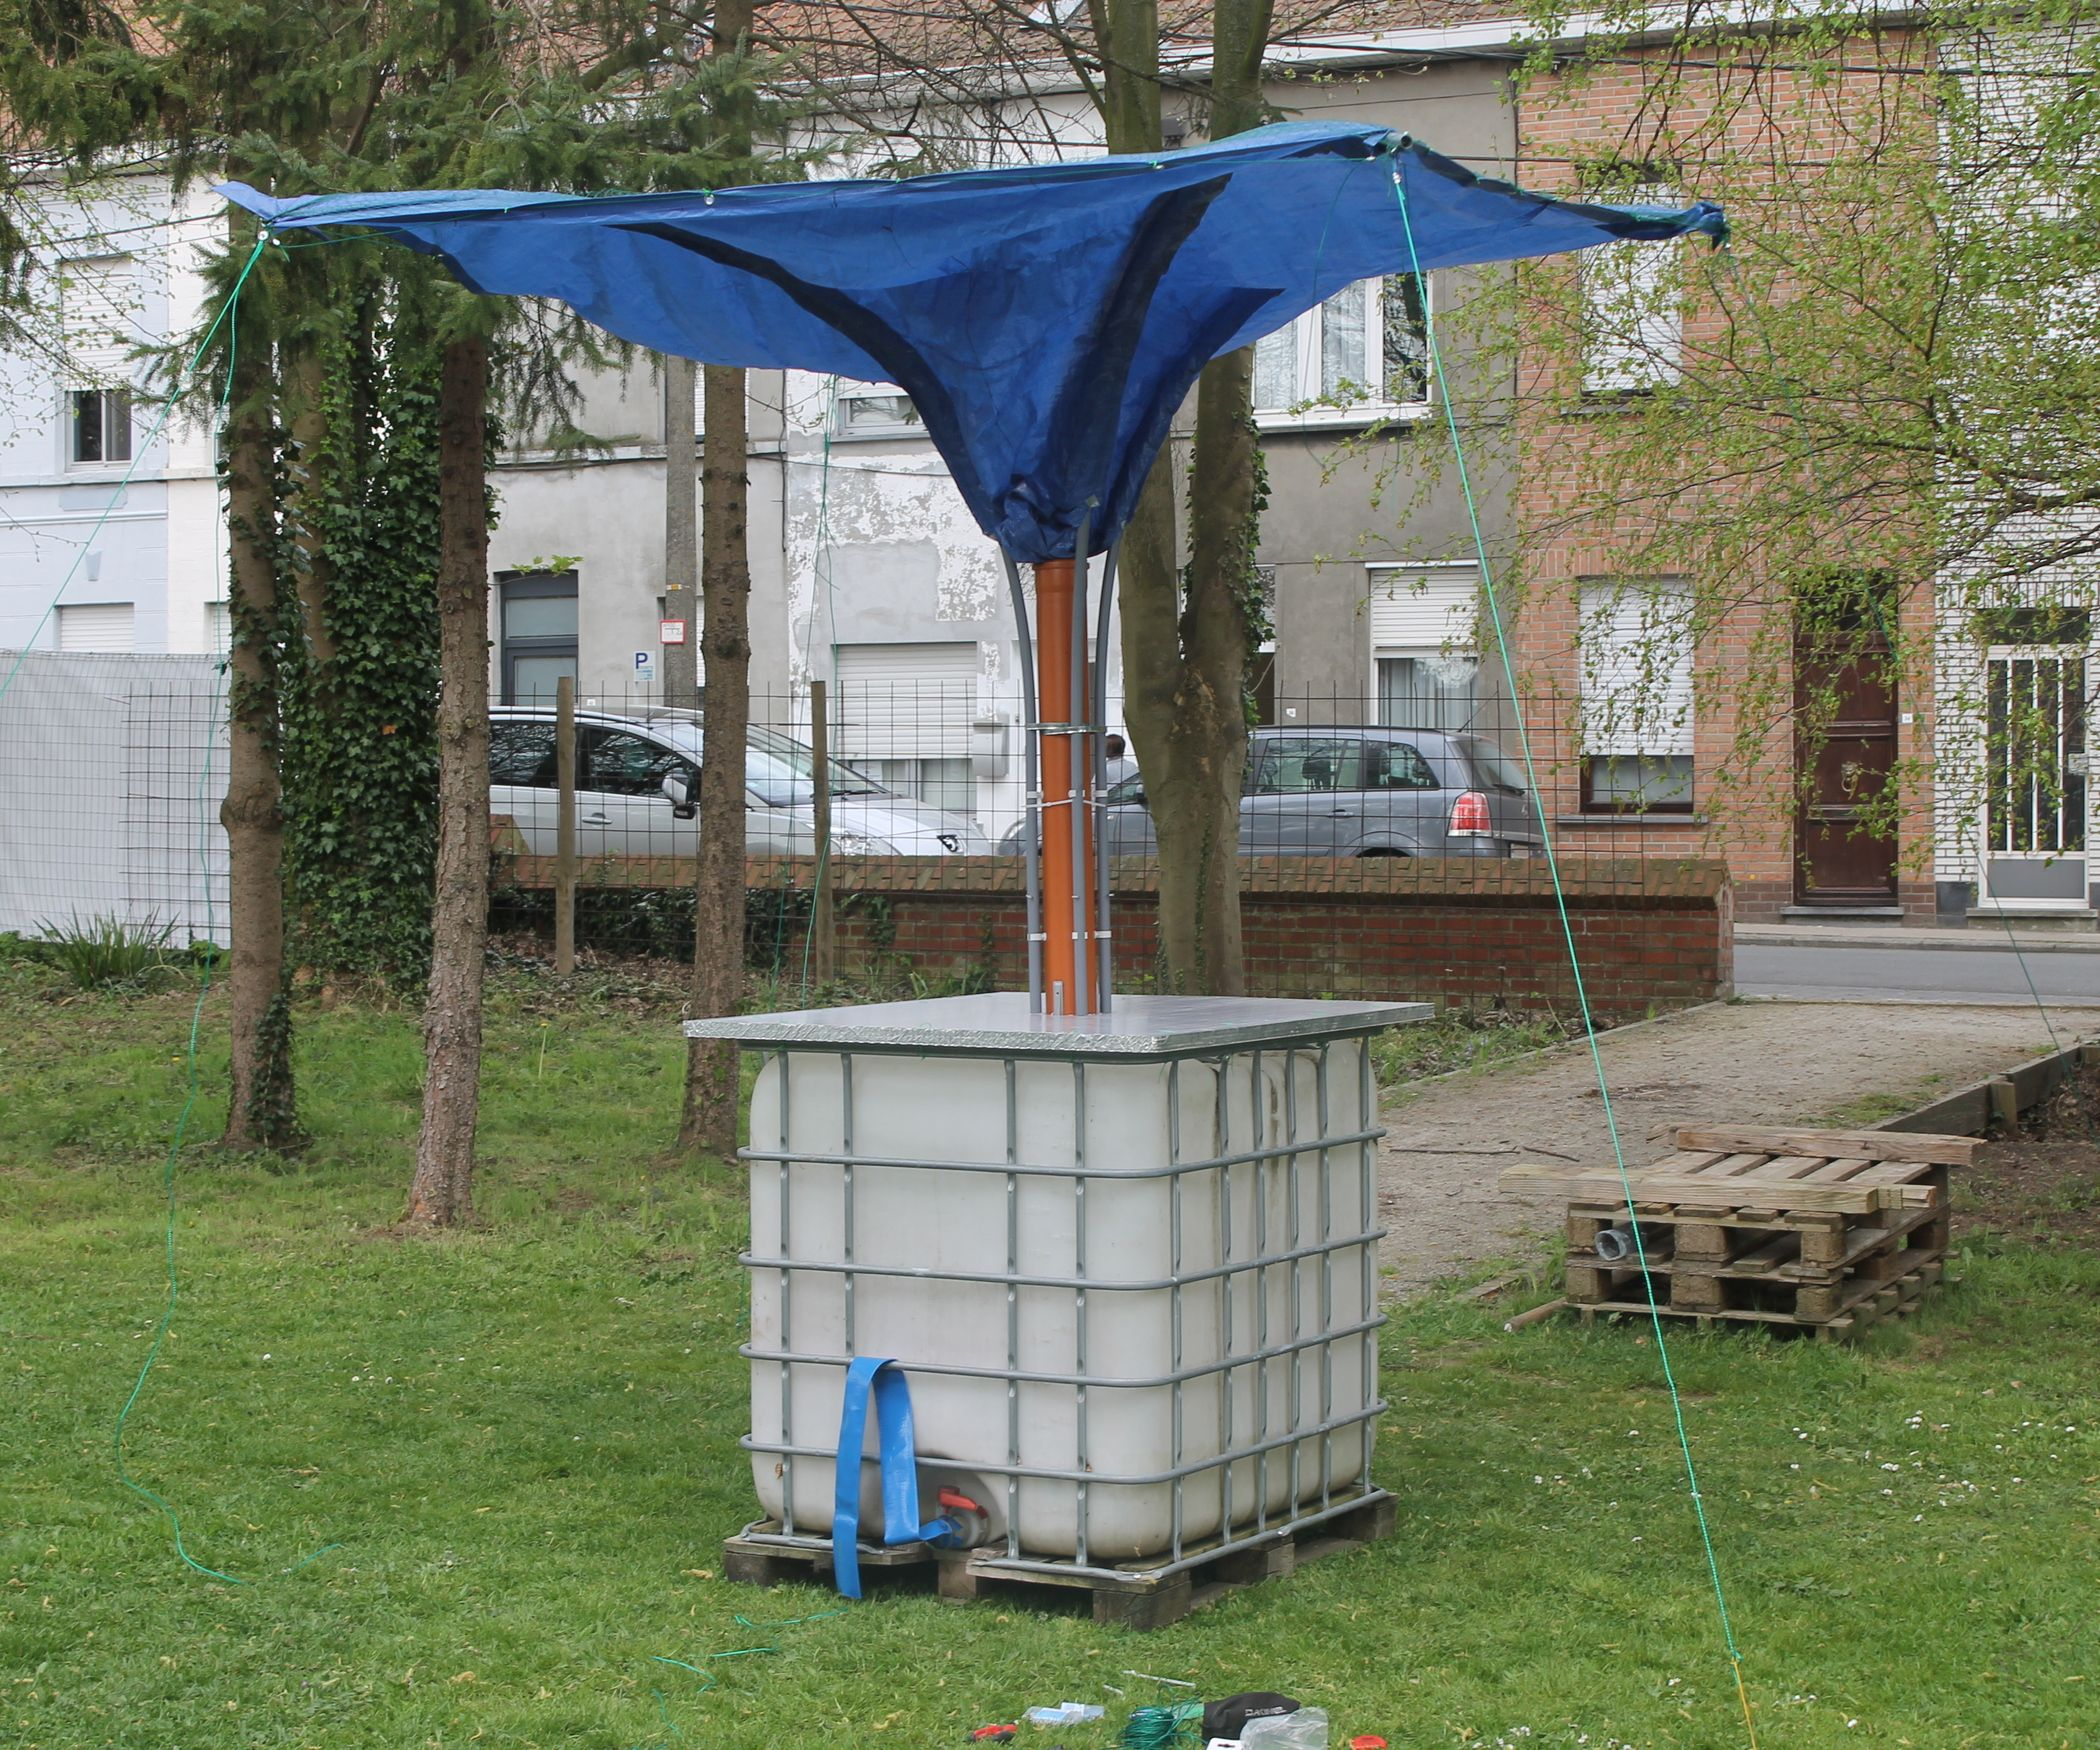 STANDALONE RAINWATER COLLECTOR Rainwater harvesting